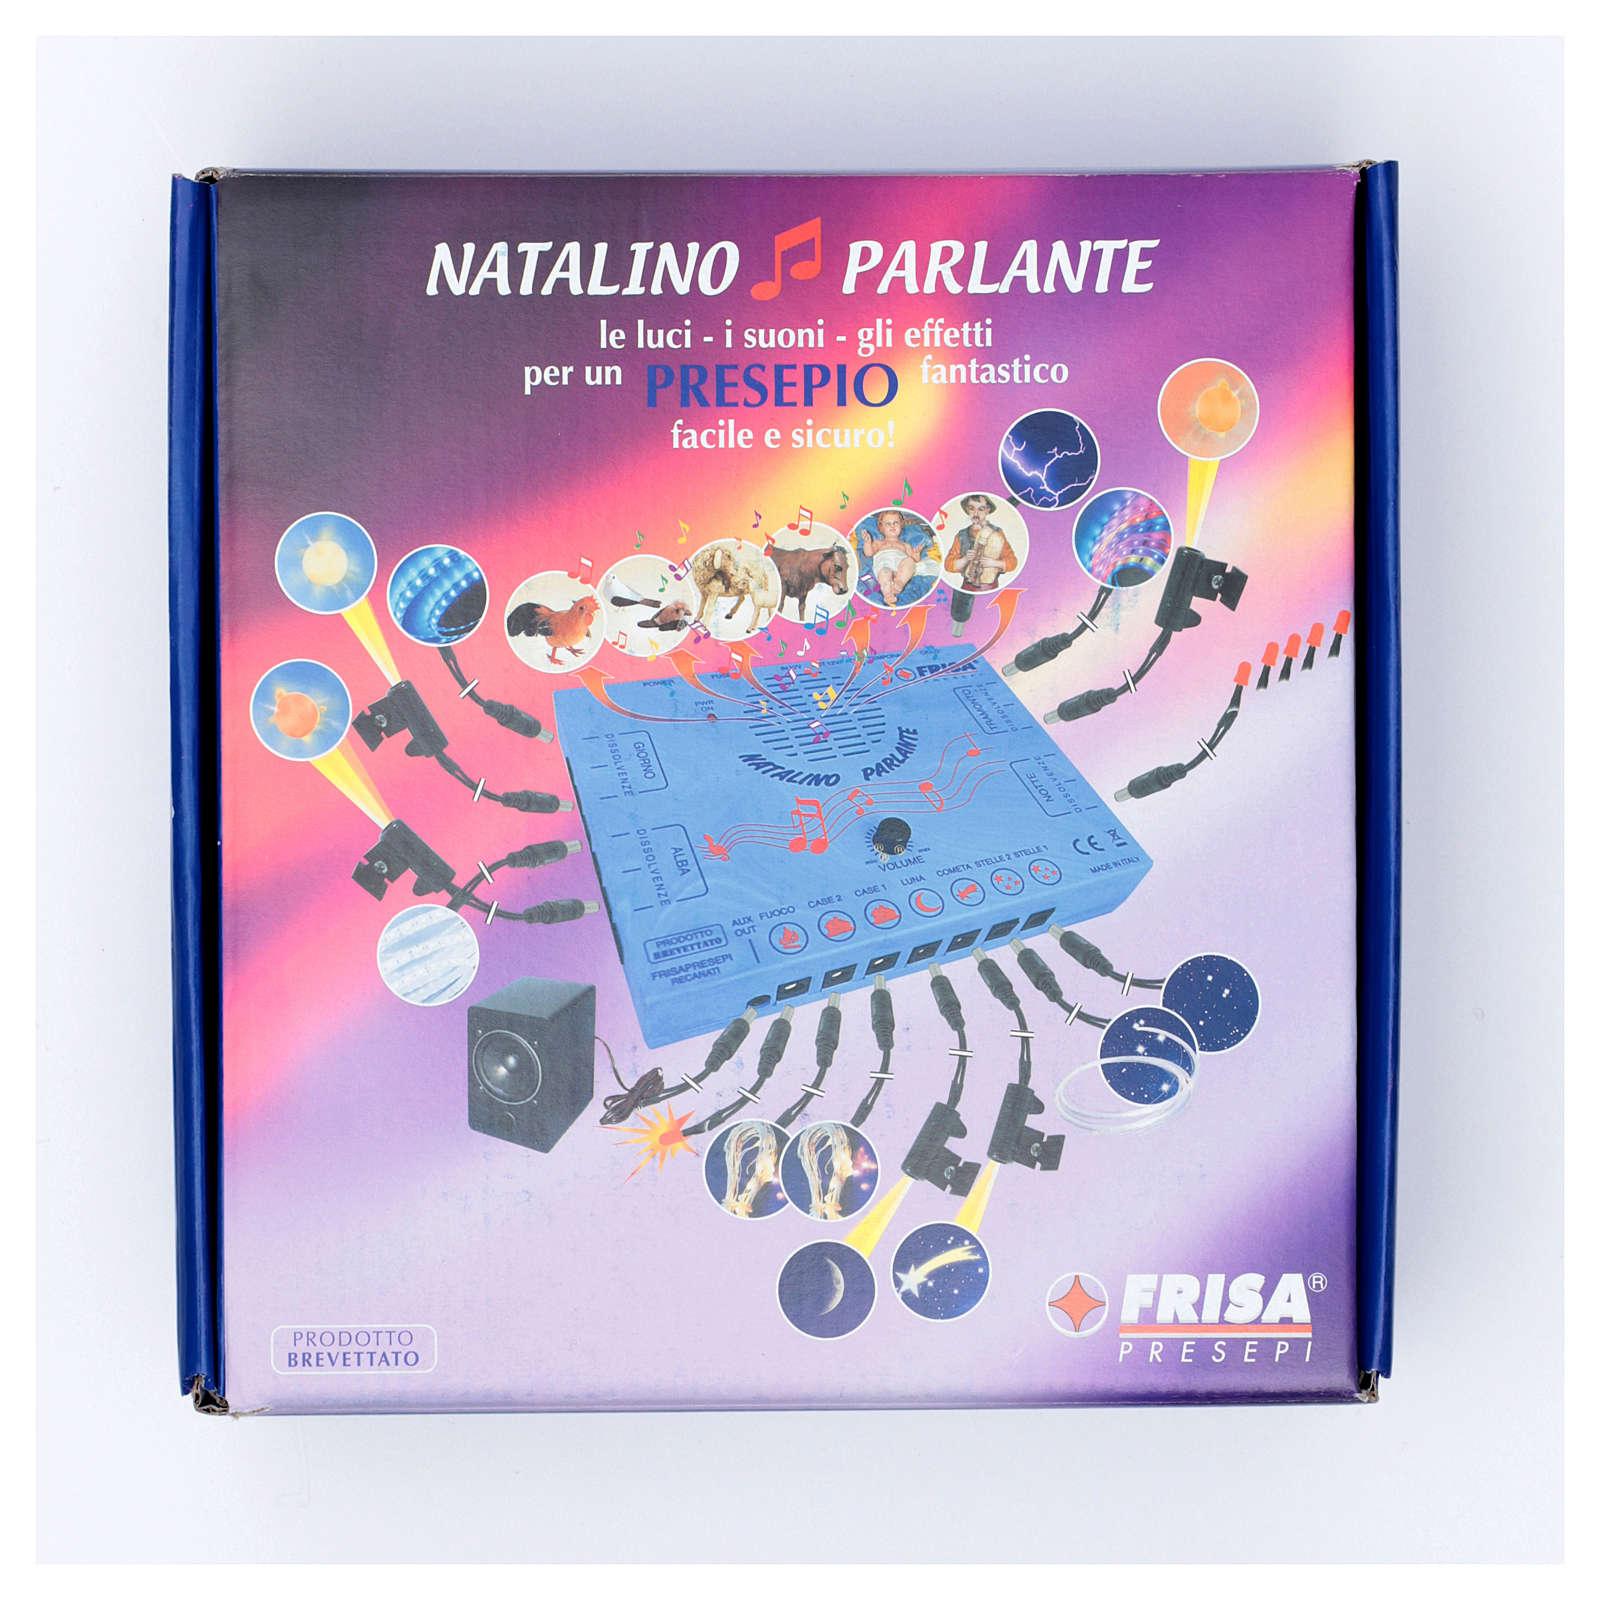 Natalino parlante led Frisalight gestione effetti-luci-suoni 4